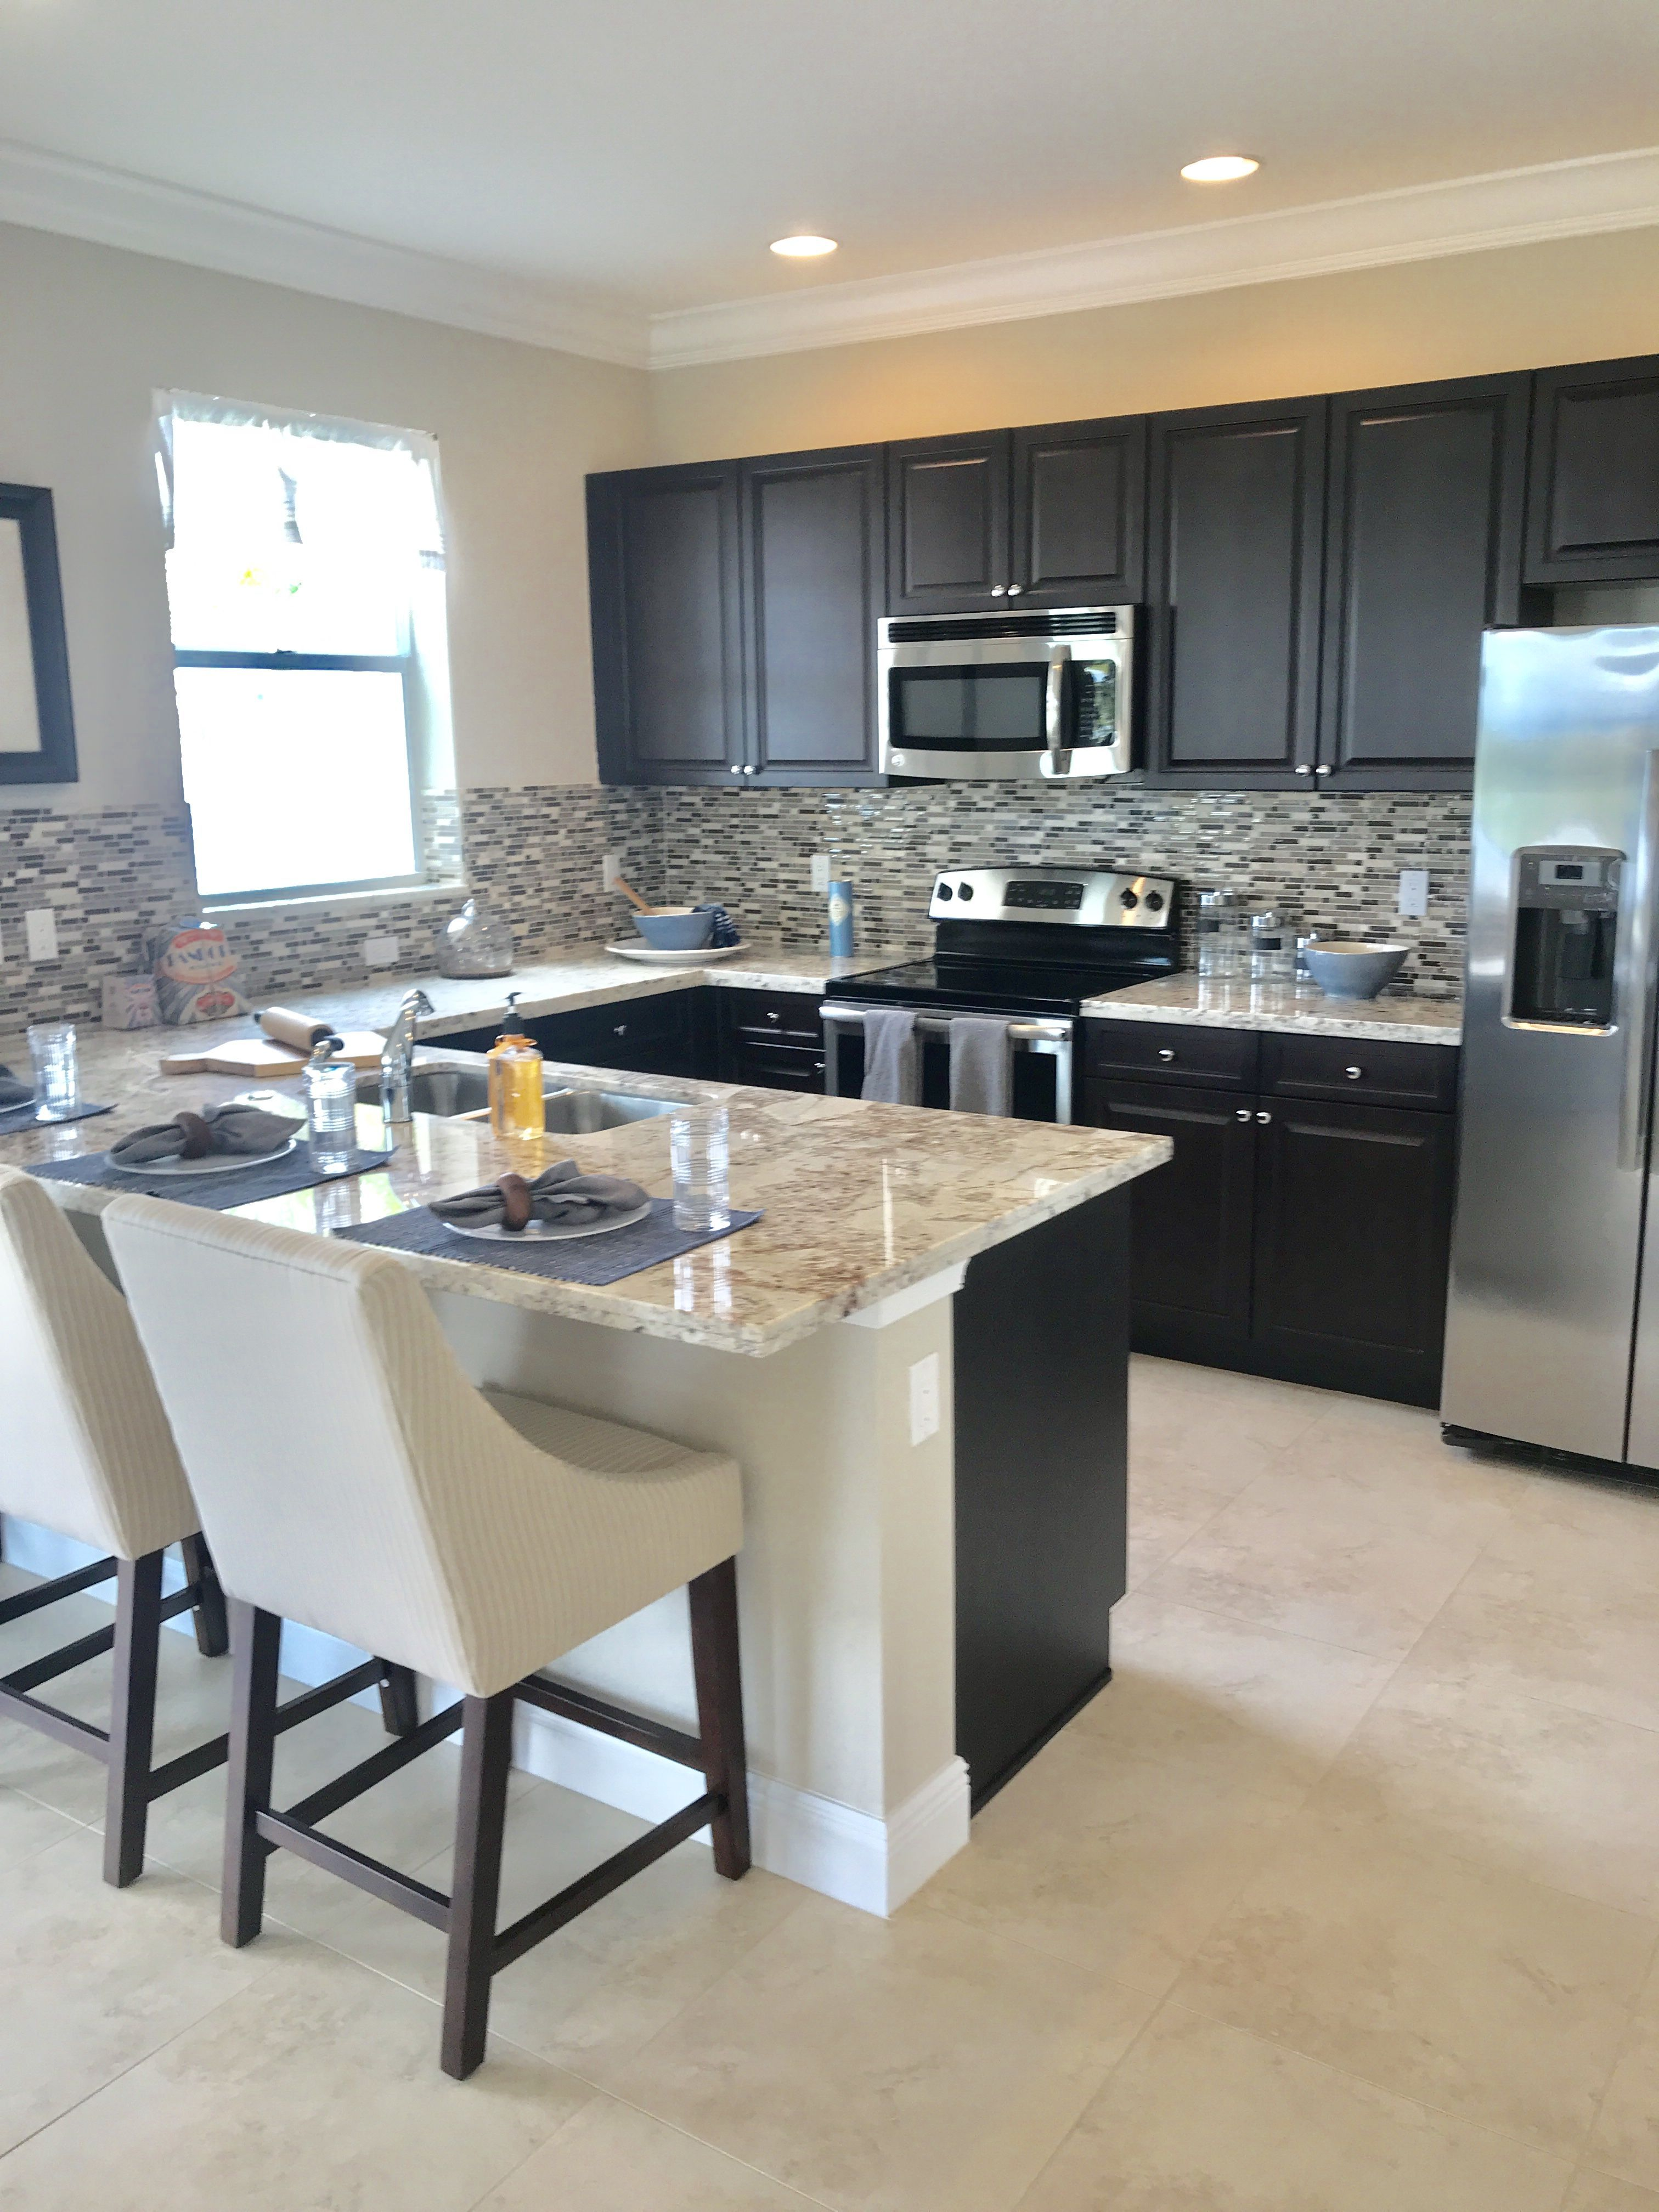 Small Kitchen Design 10x10: 10 Styles Perfect For Your Tiny Kitchen #kitchenaid